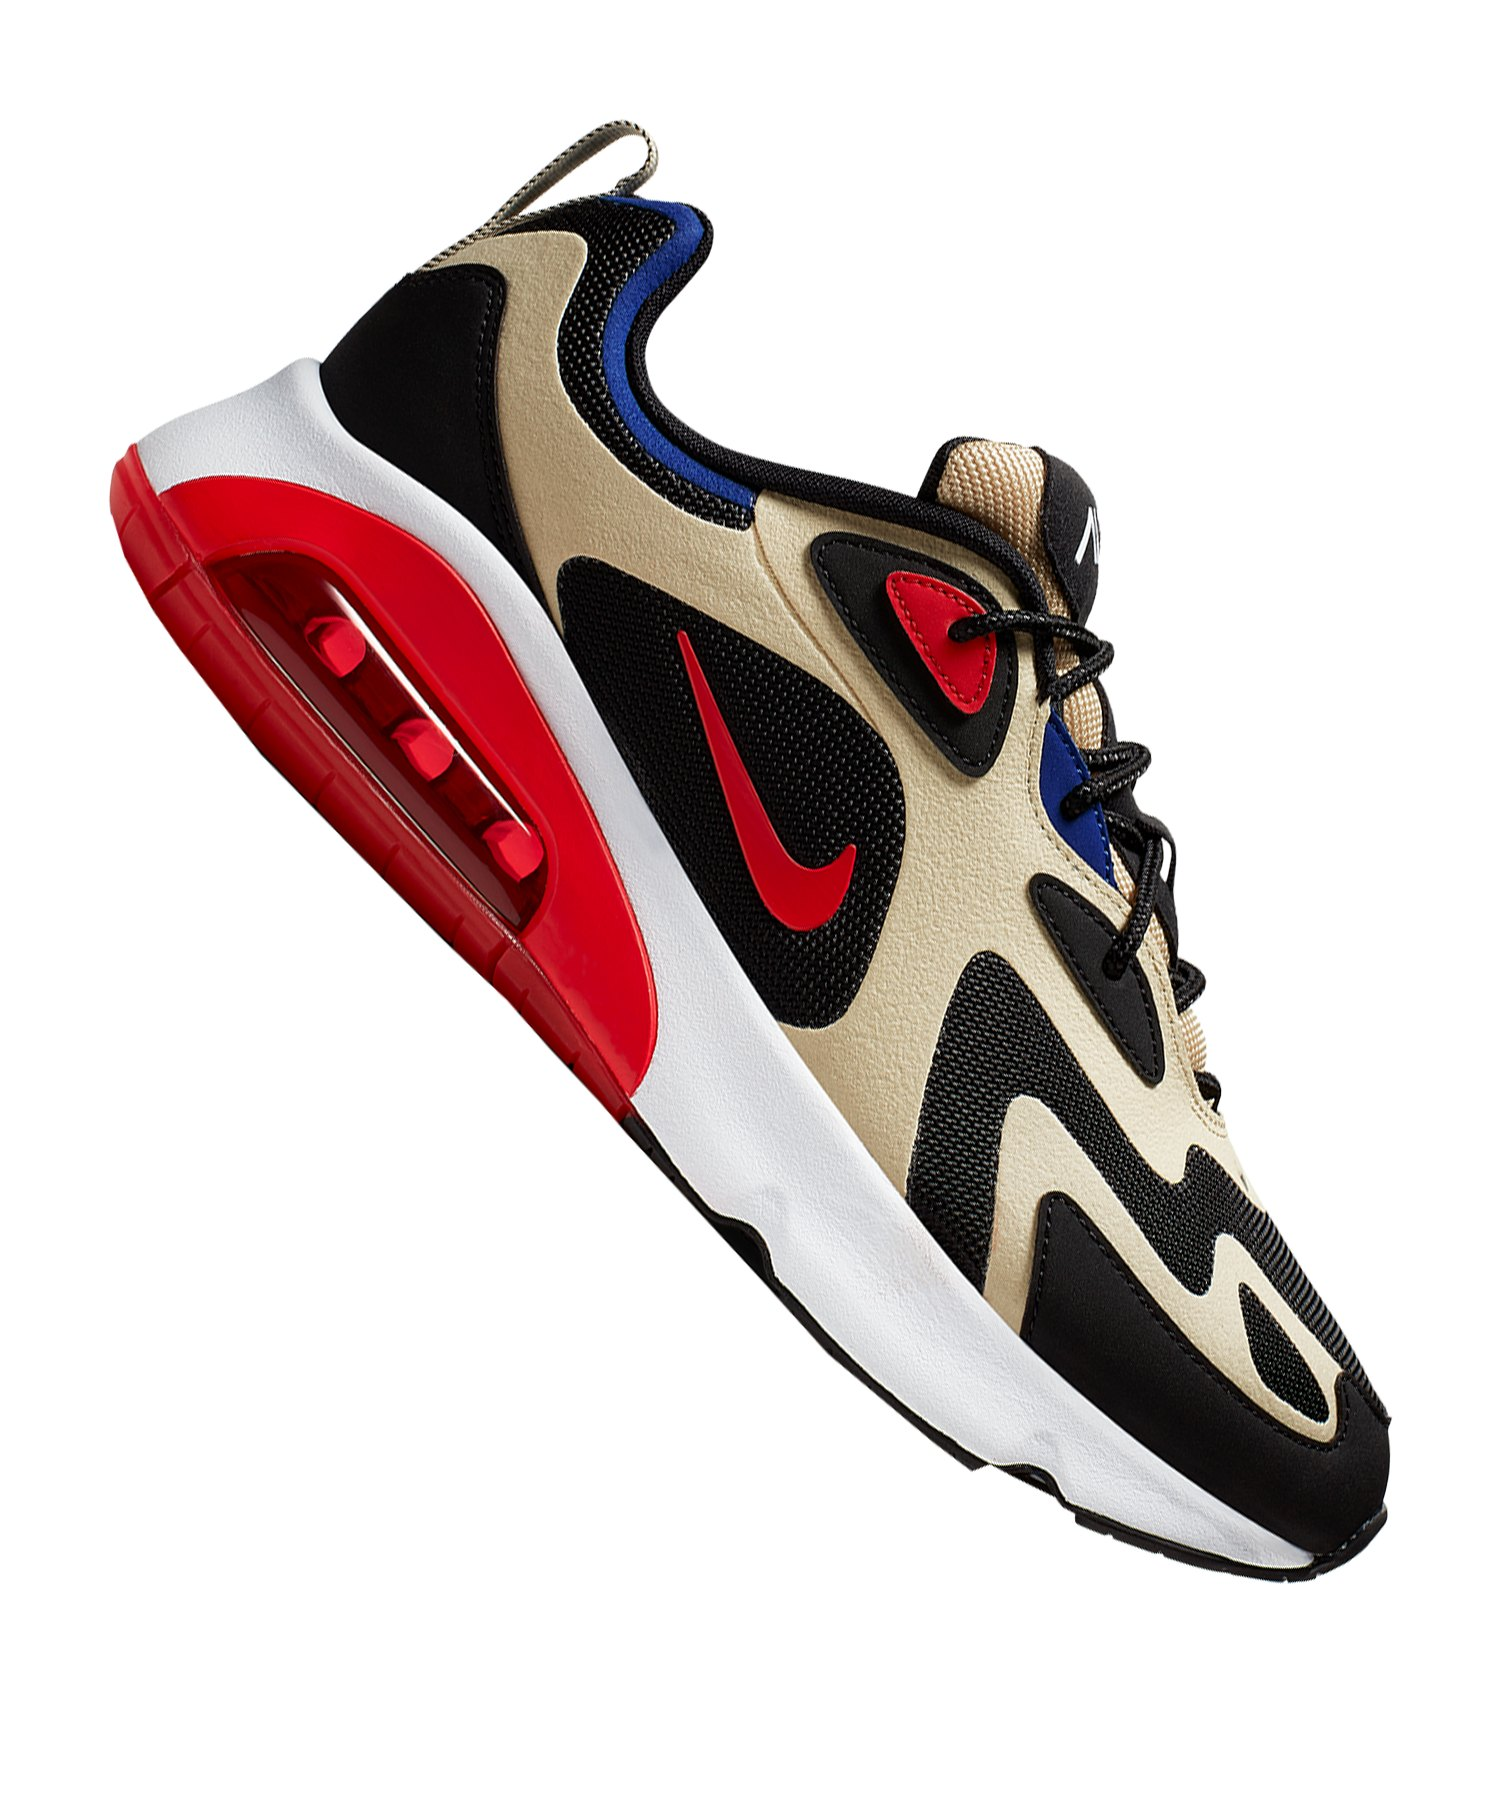 Nike Lifestyle Schuhe Damen | Nike Air Max 1 Premium SC Gold